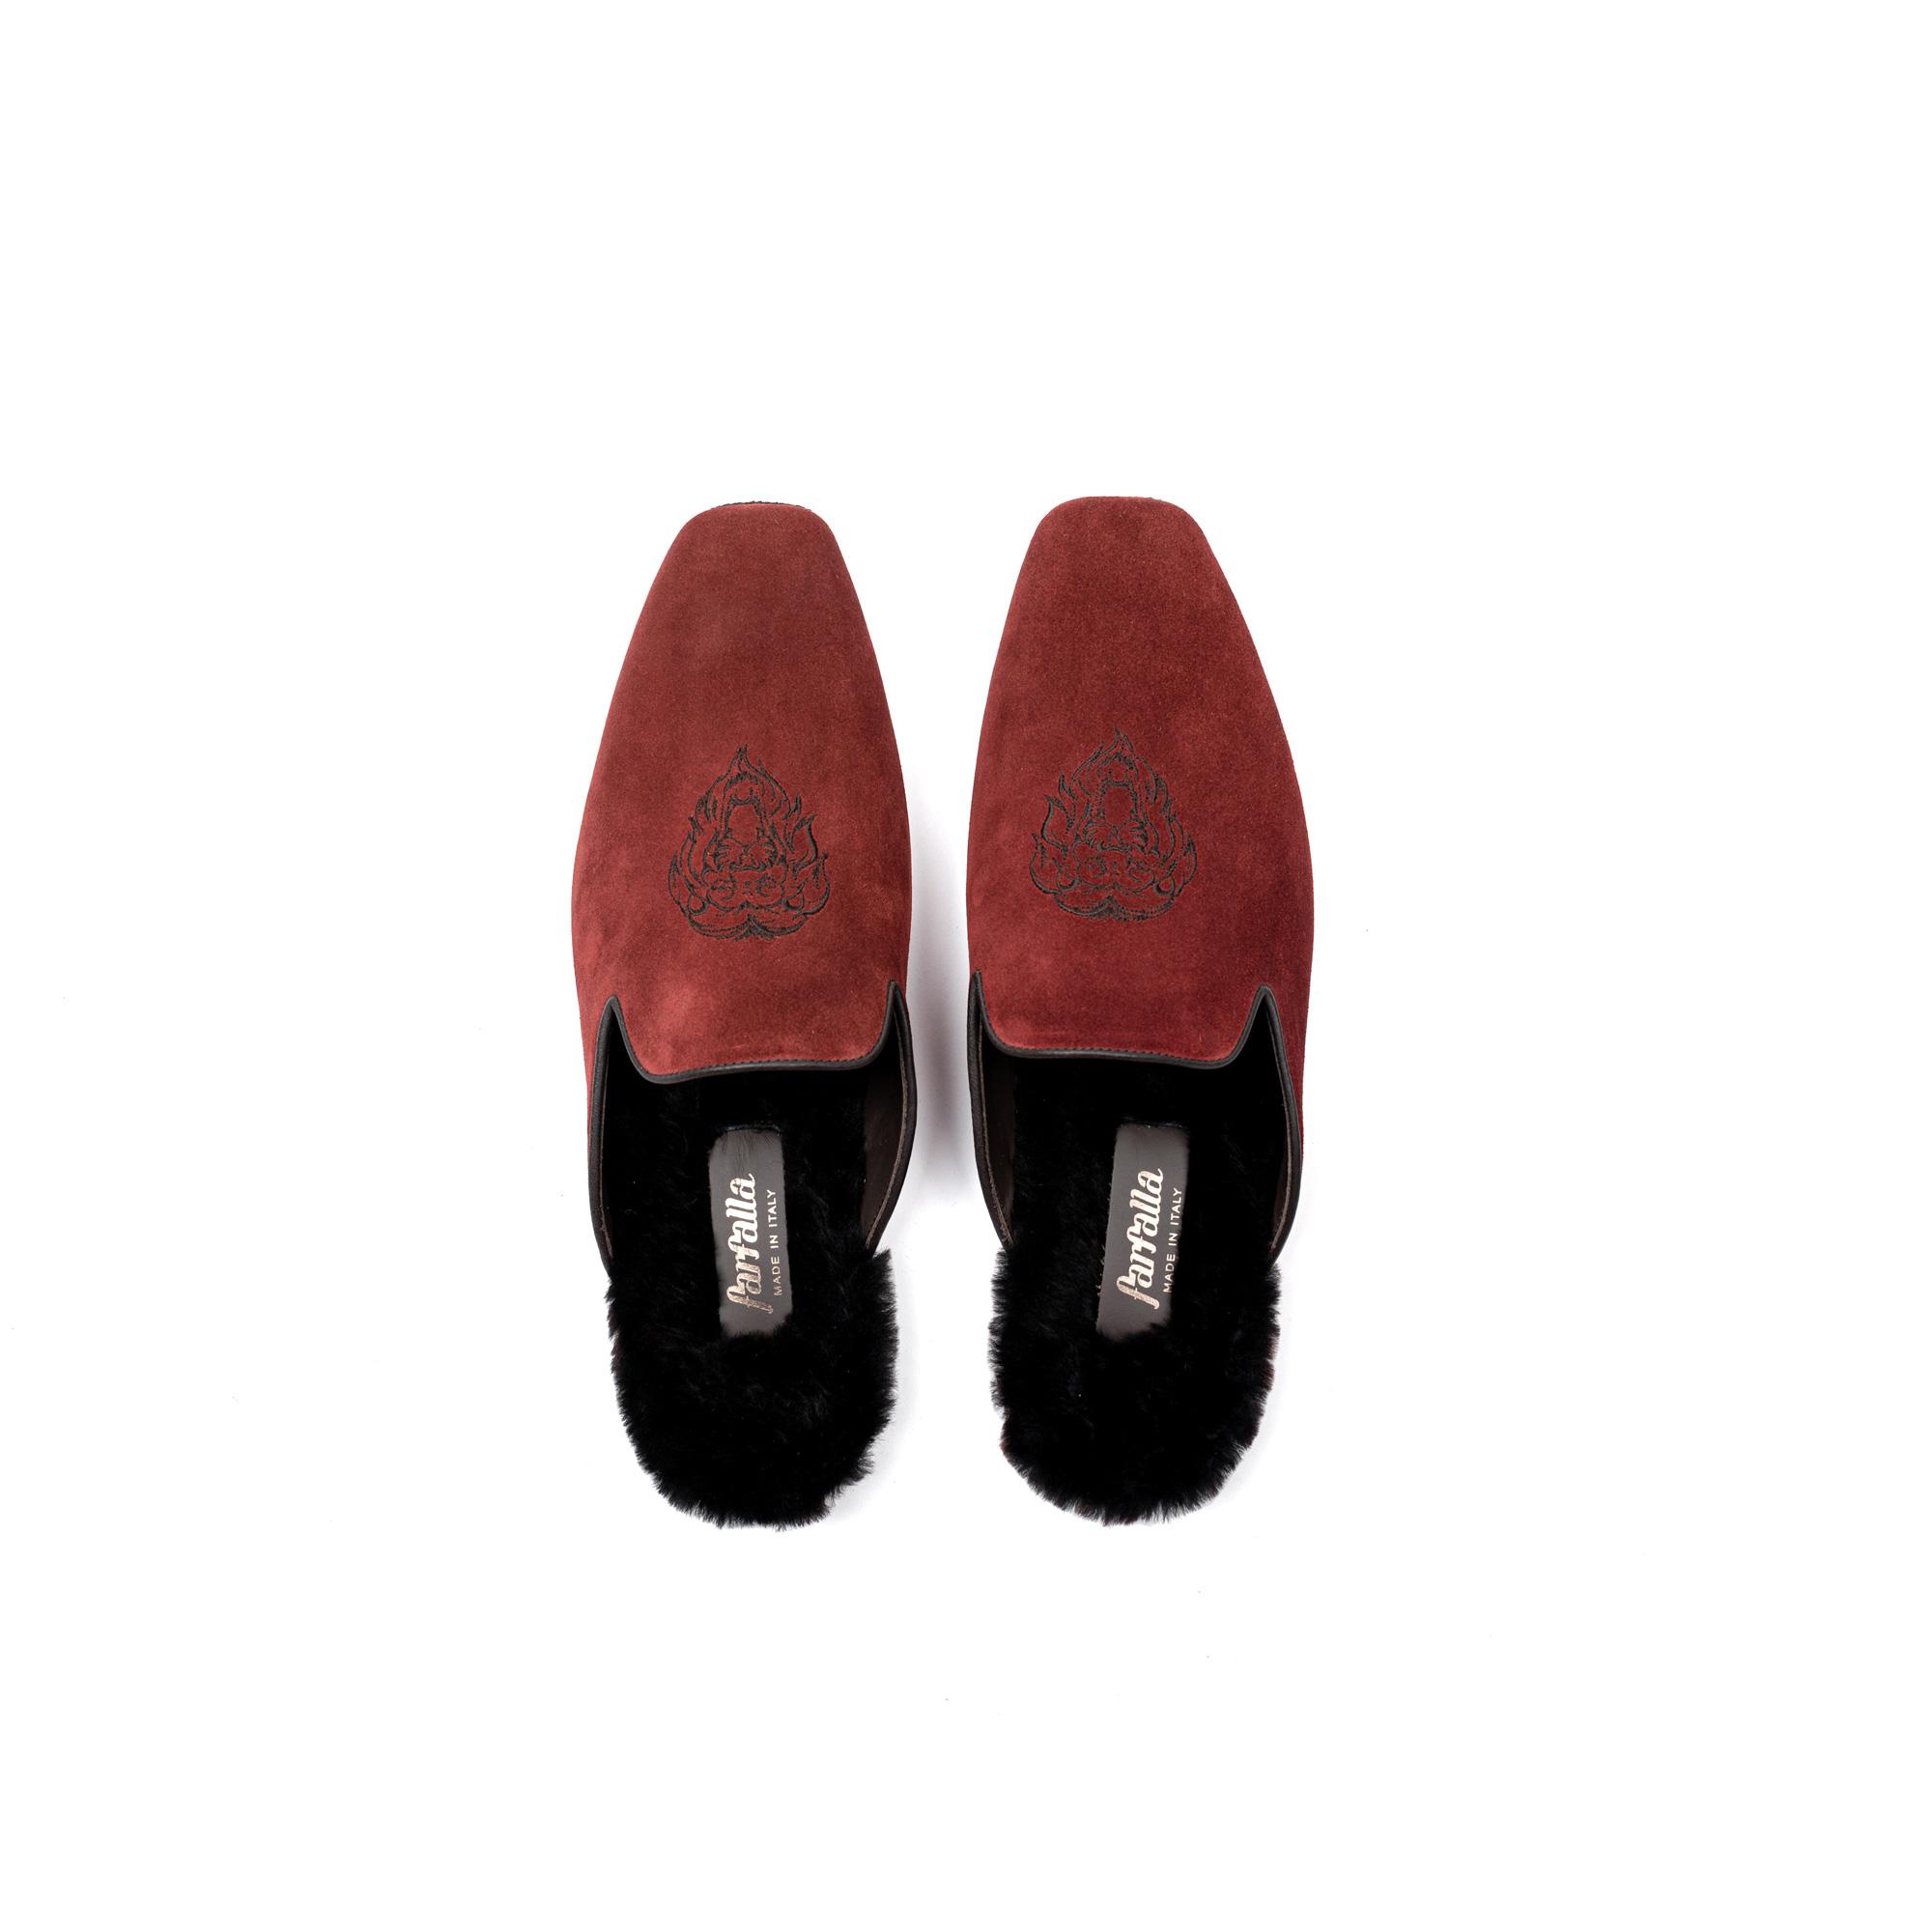 Pantofola interno lusso in velour cherry - Farfalla italian slippers